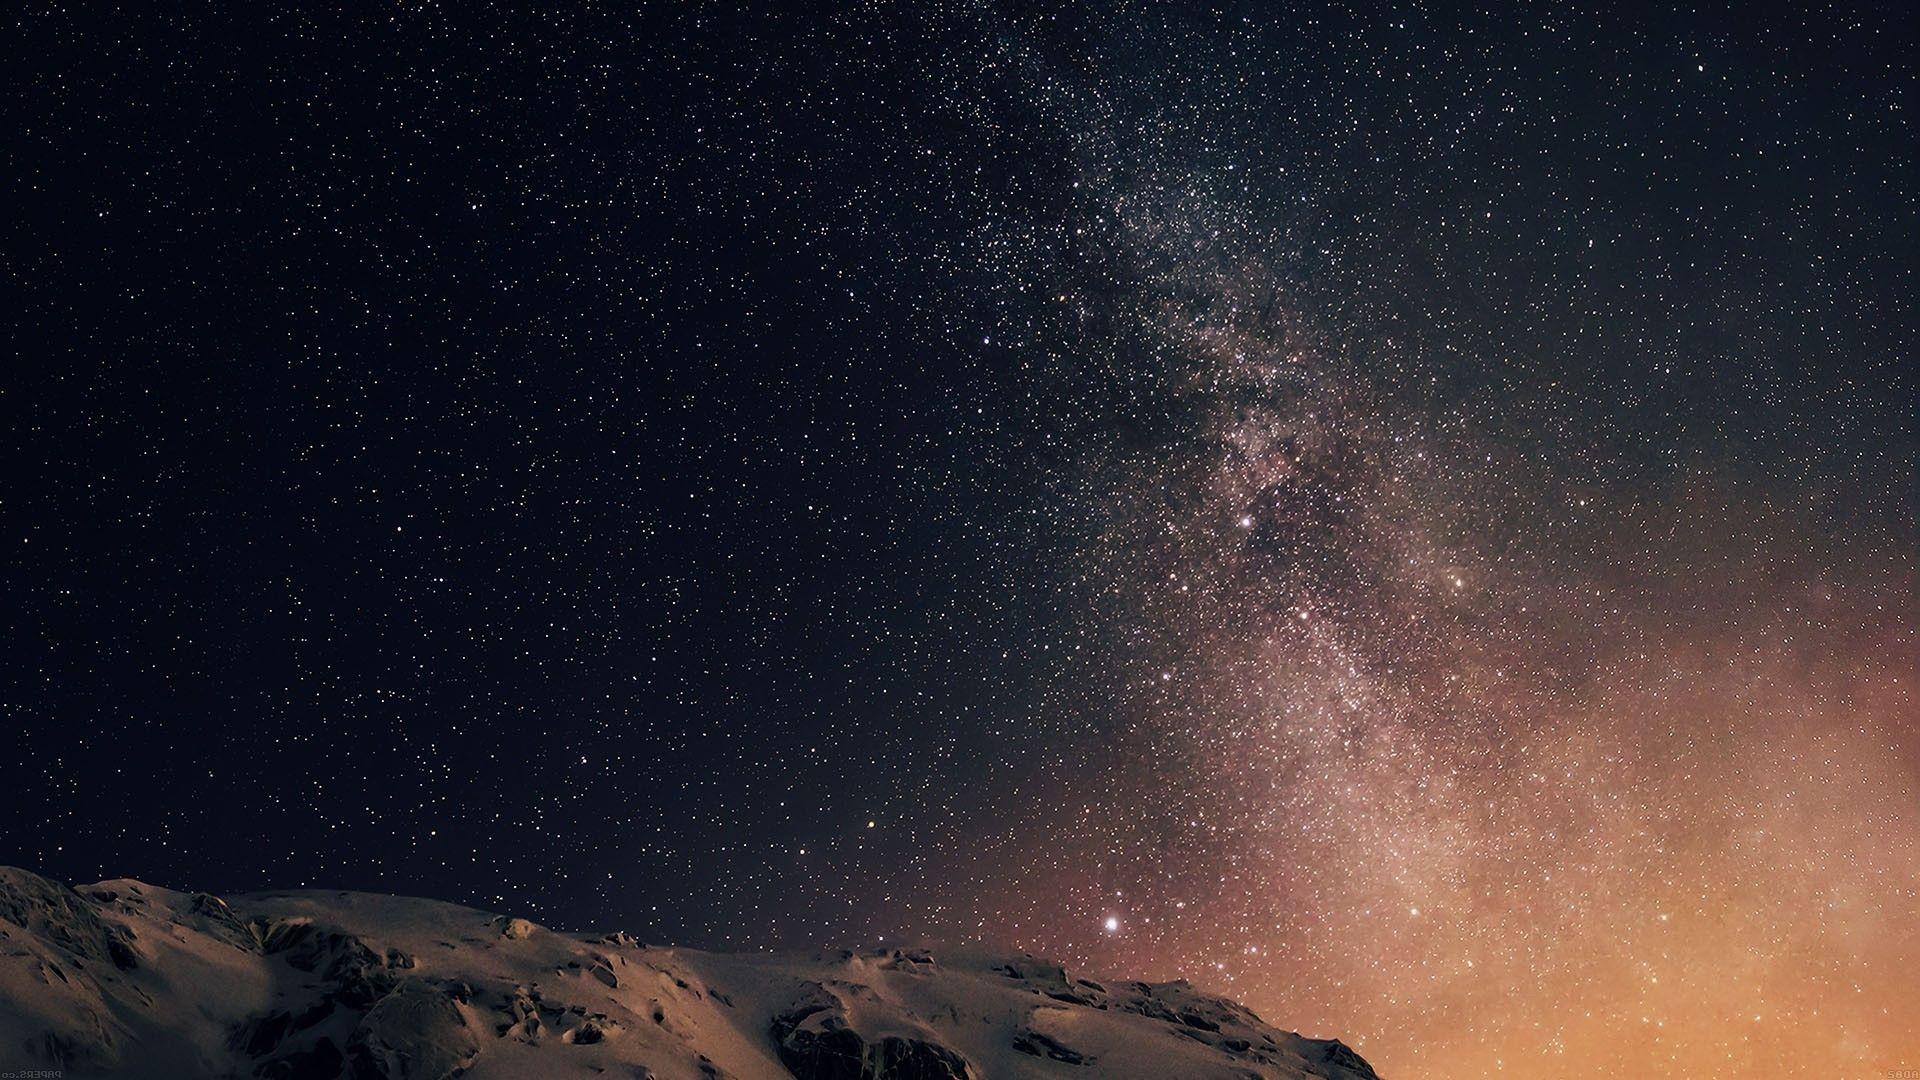 Stars Space Galaxy Planetes Dark Wallpapers Hd Dark Desktop Backgrounds Dark Background Wallpaper Hd Wallpaper Desktop